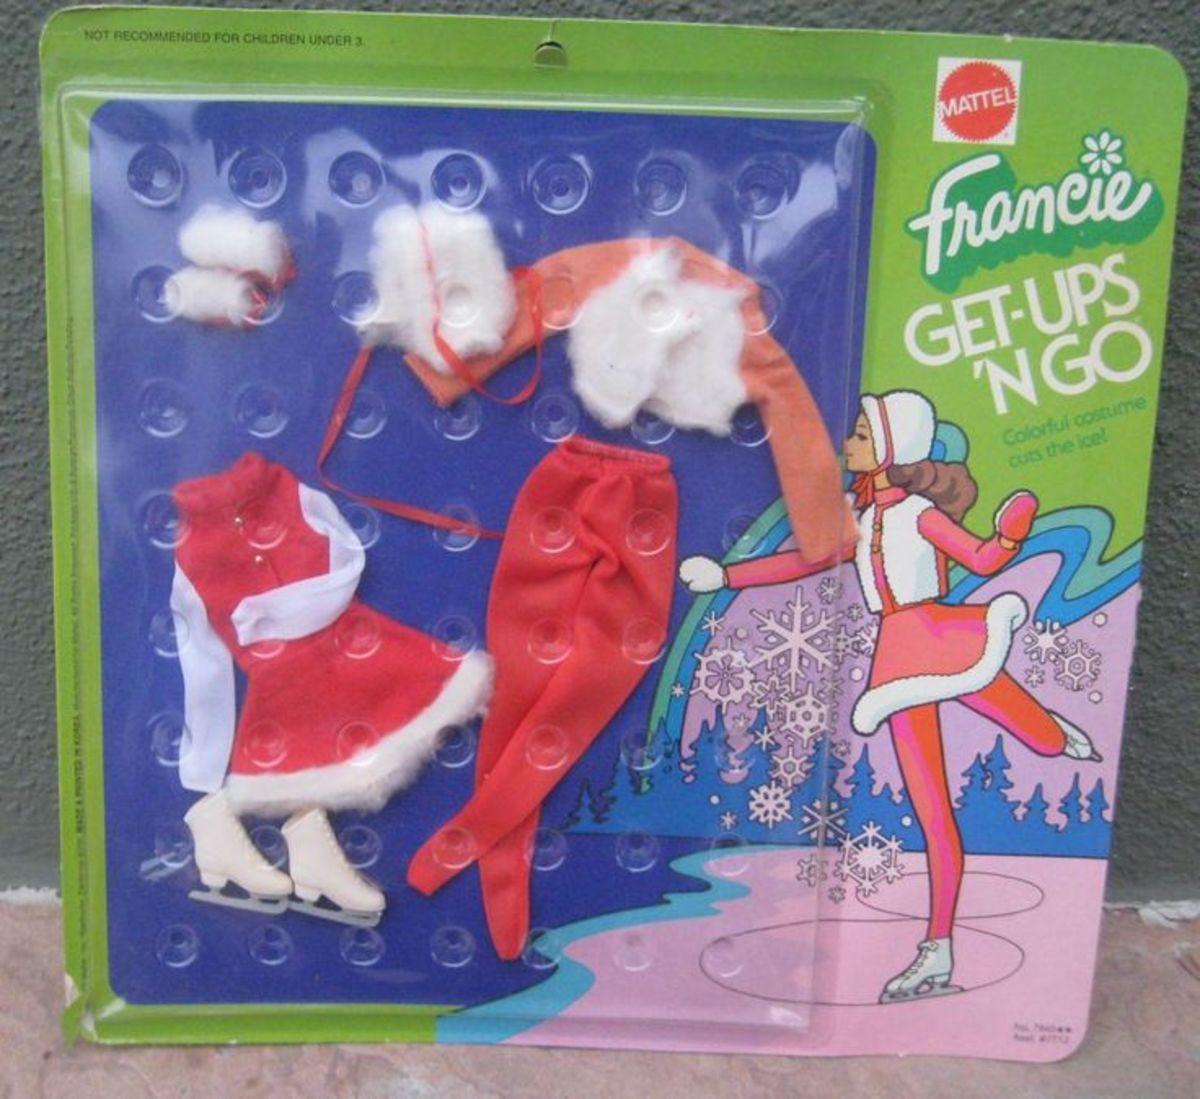 Francie Doll Get Ups 'N Go #7845; Ice Skating